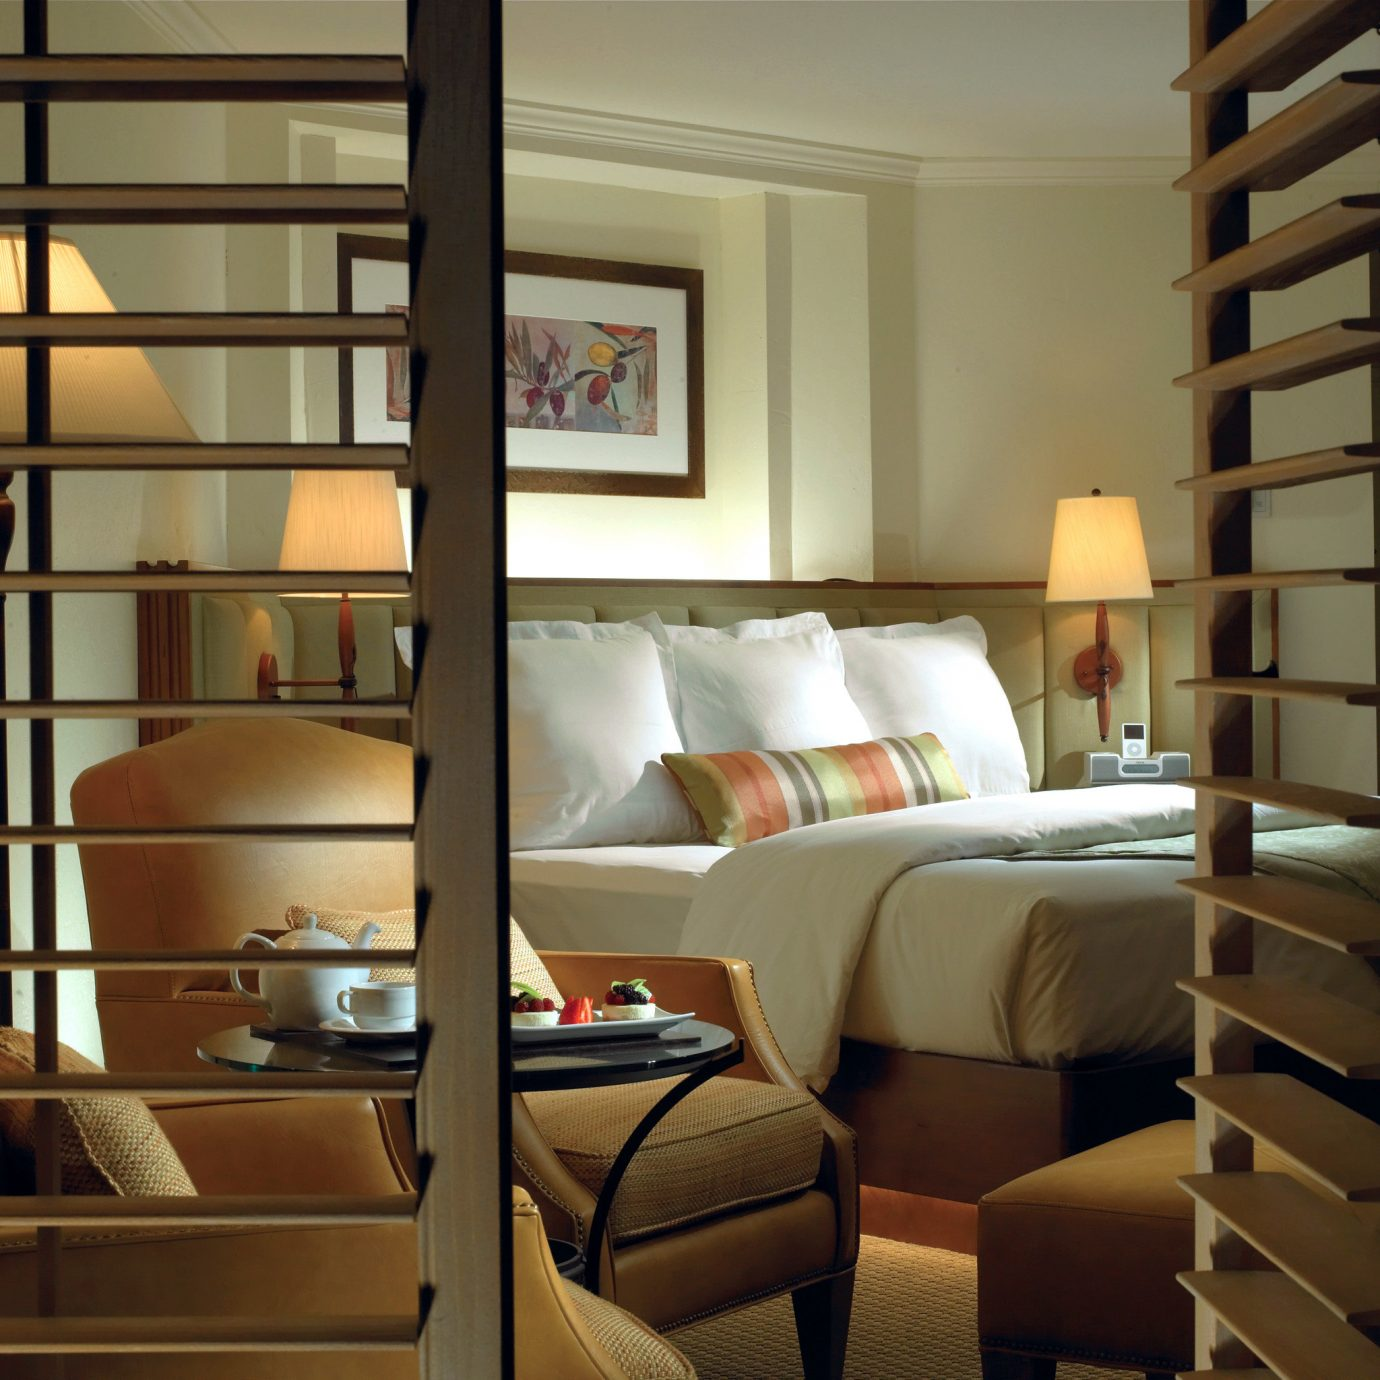 Bedroom Hotels Inn Resort property home living room condominium stairs